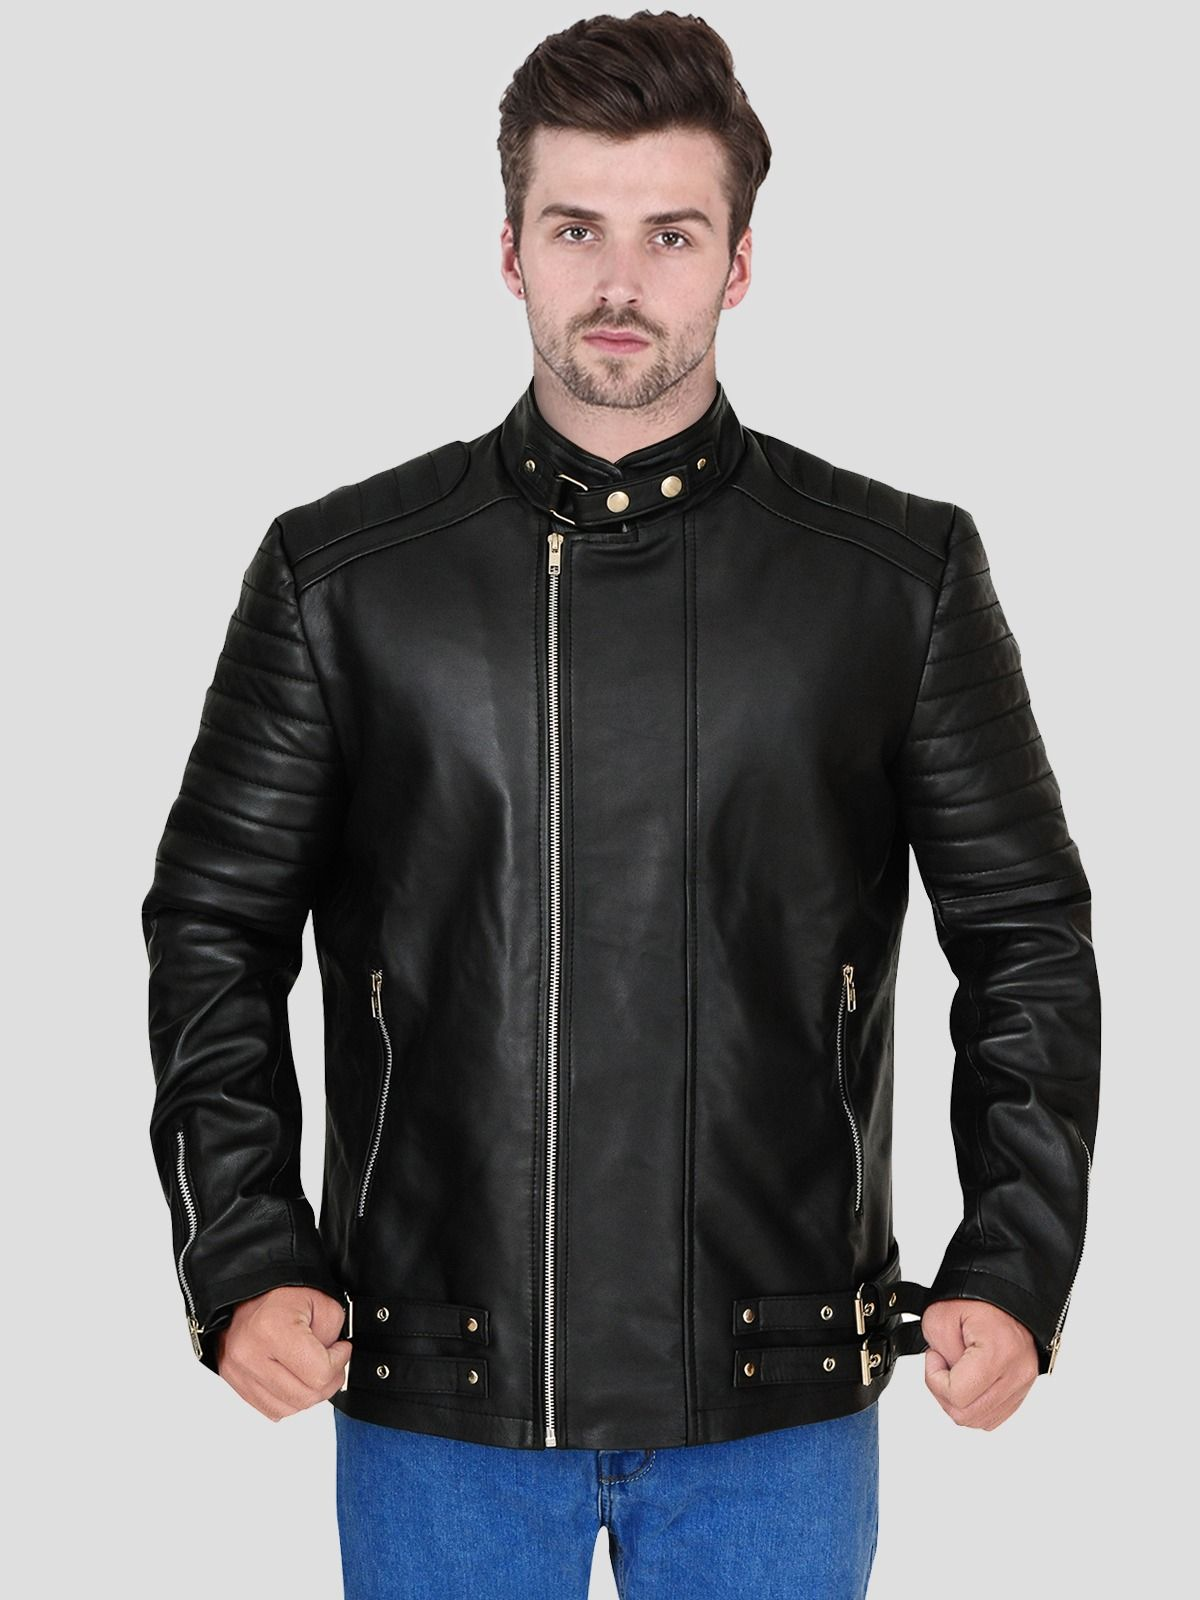 Black Faux Leather Winter Jacket For Men Leather Jacket Style Stylish Leather Jacket Stylish Jackets [ 1600 x 1200 Pixel ]